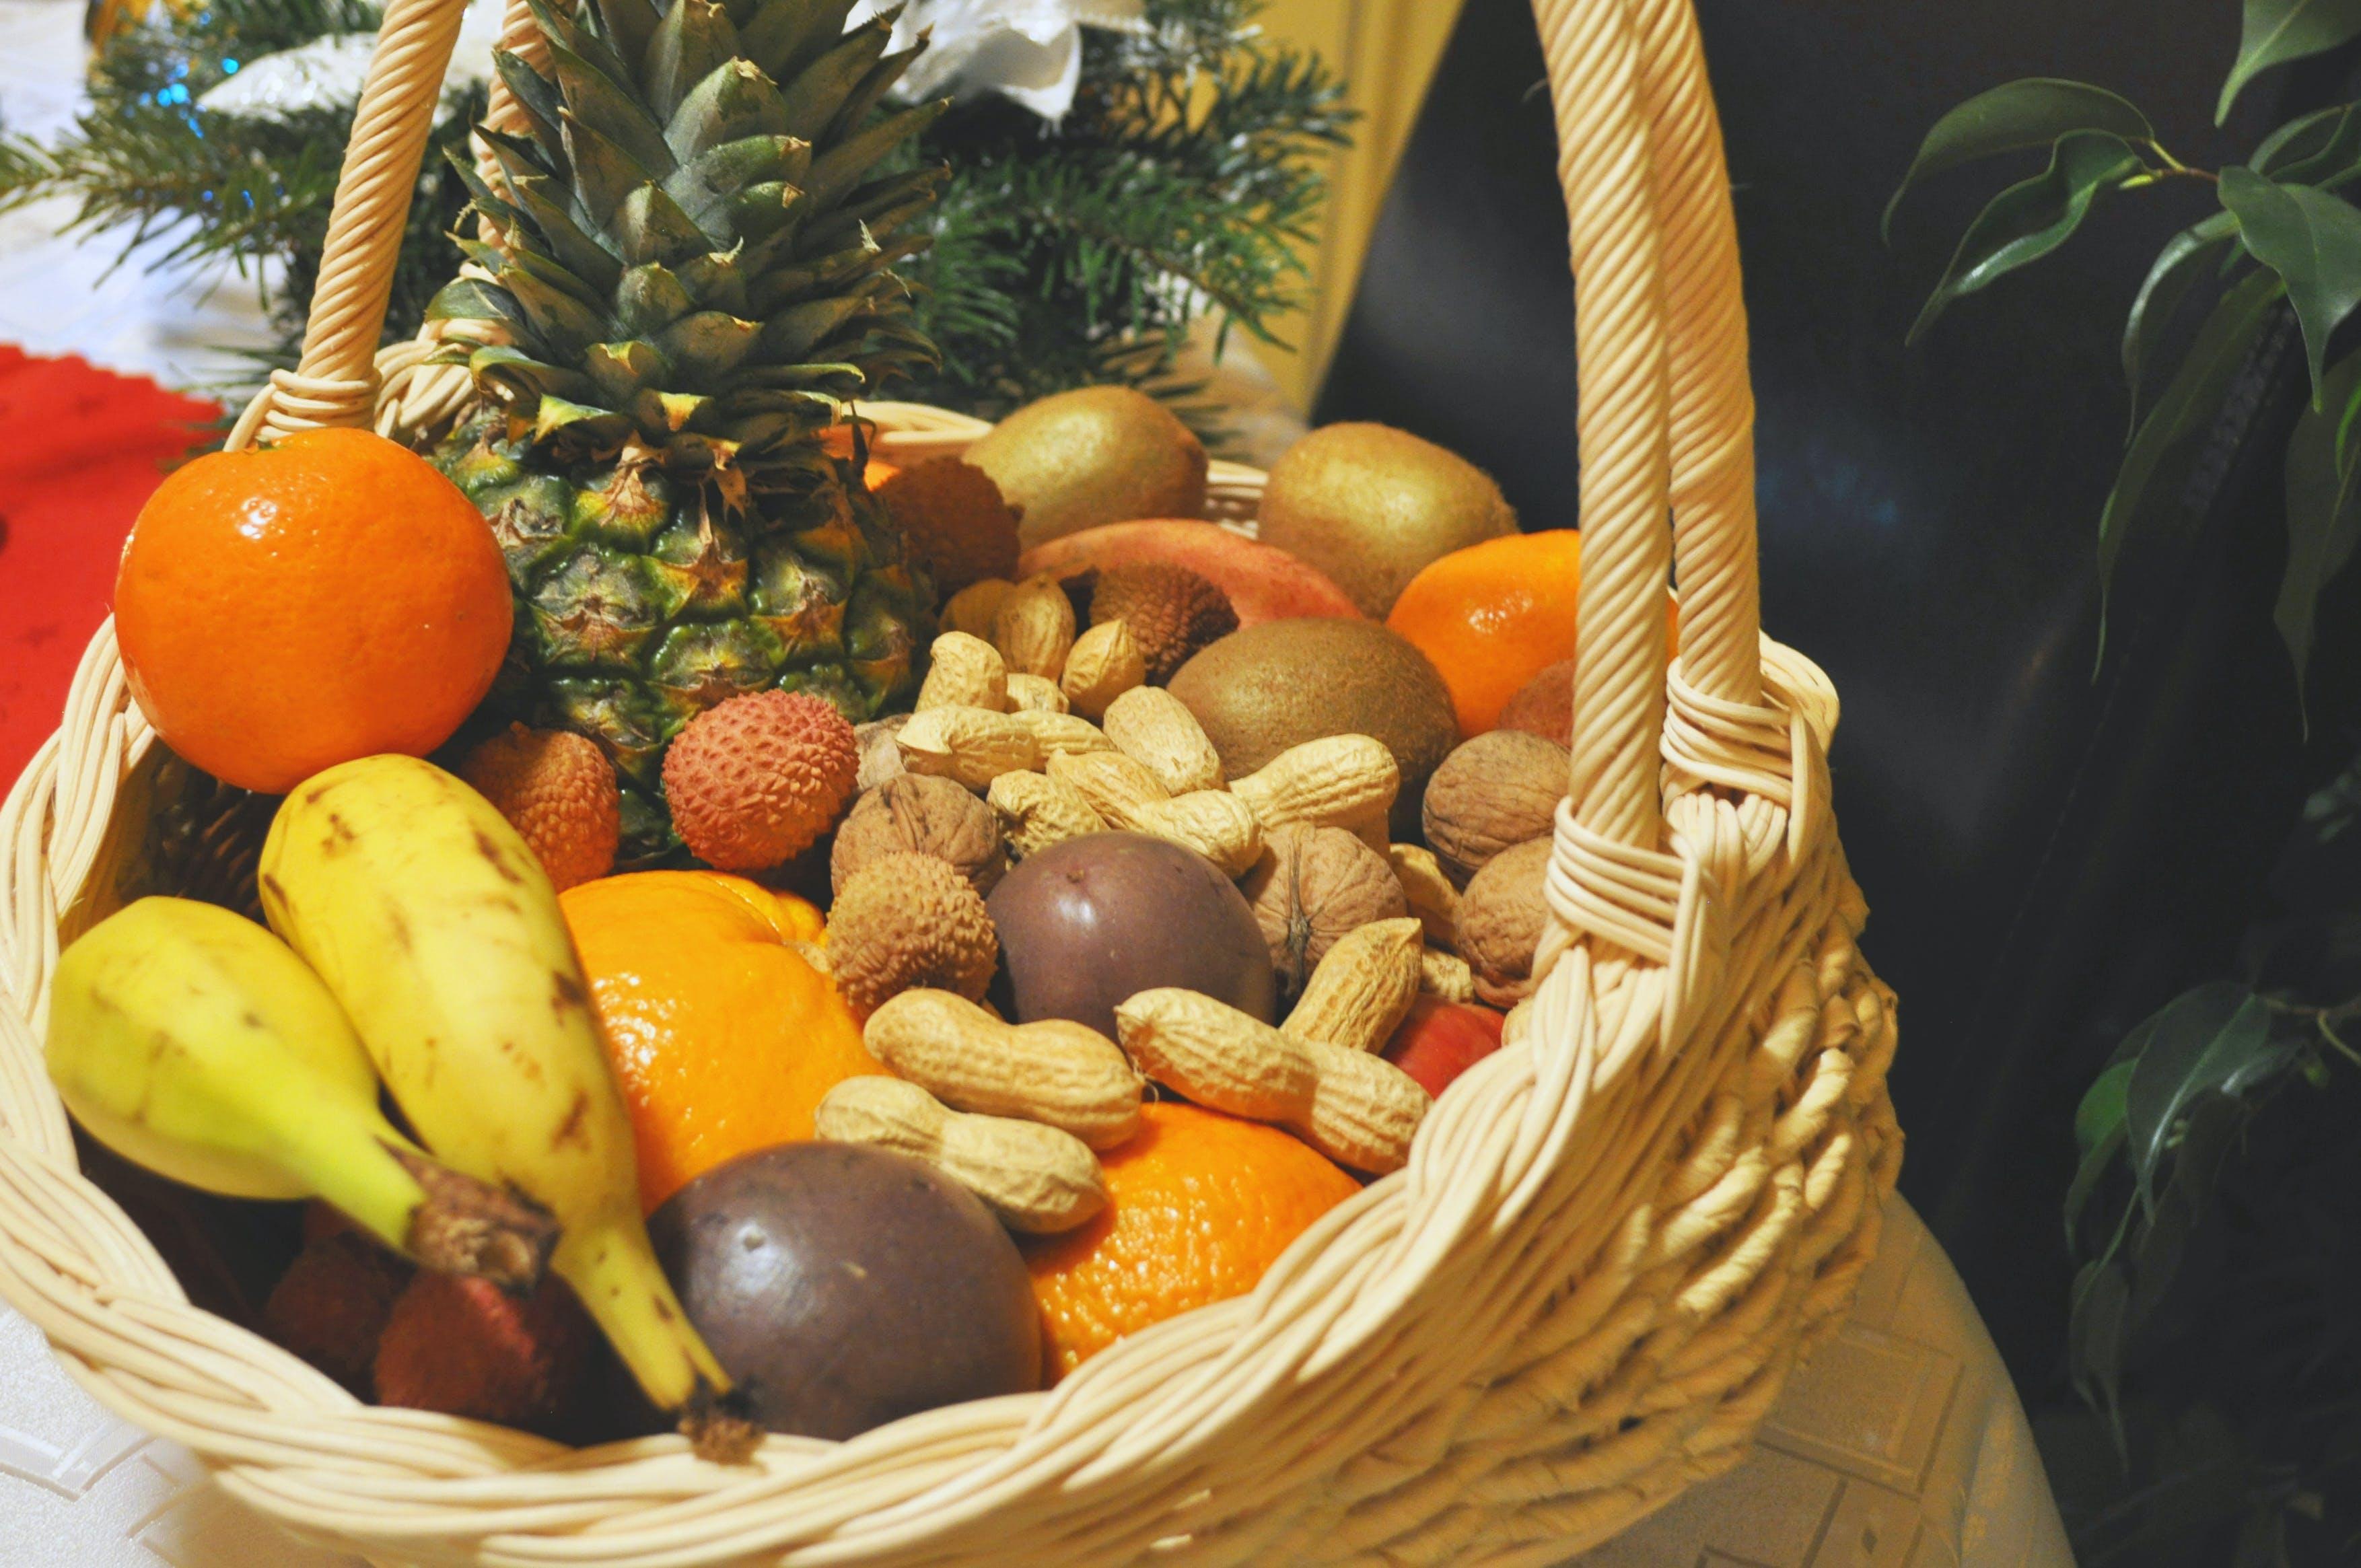 Fotobanka sbezplatnými fotkami na tému banán, citrusové ovocie, košík sovocím, ovocie